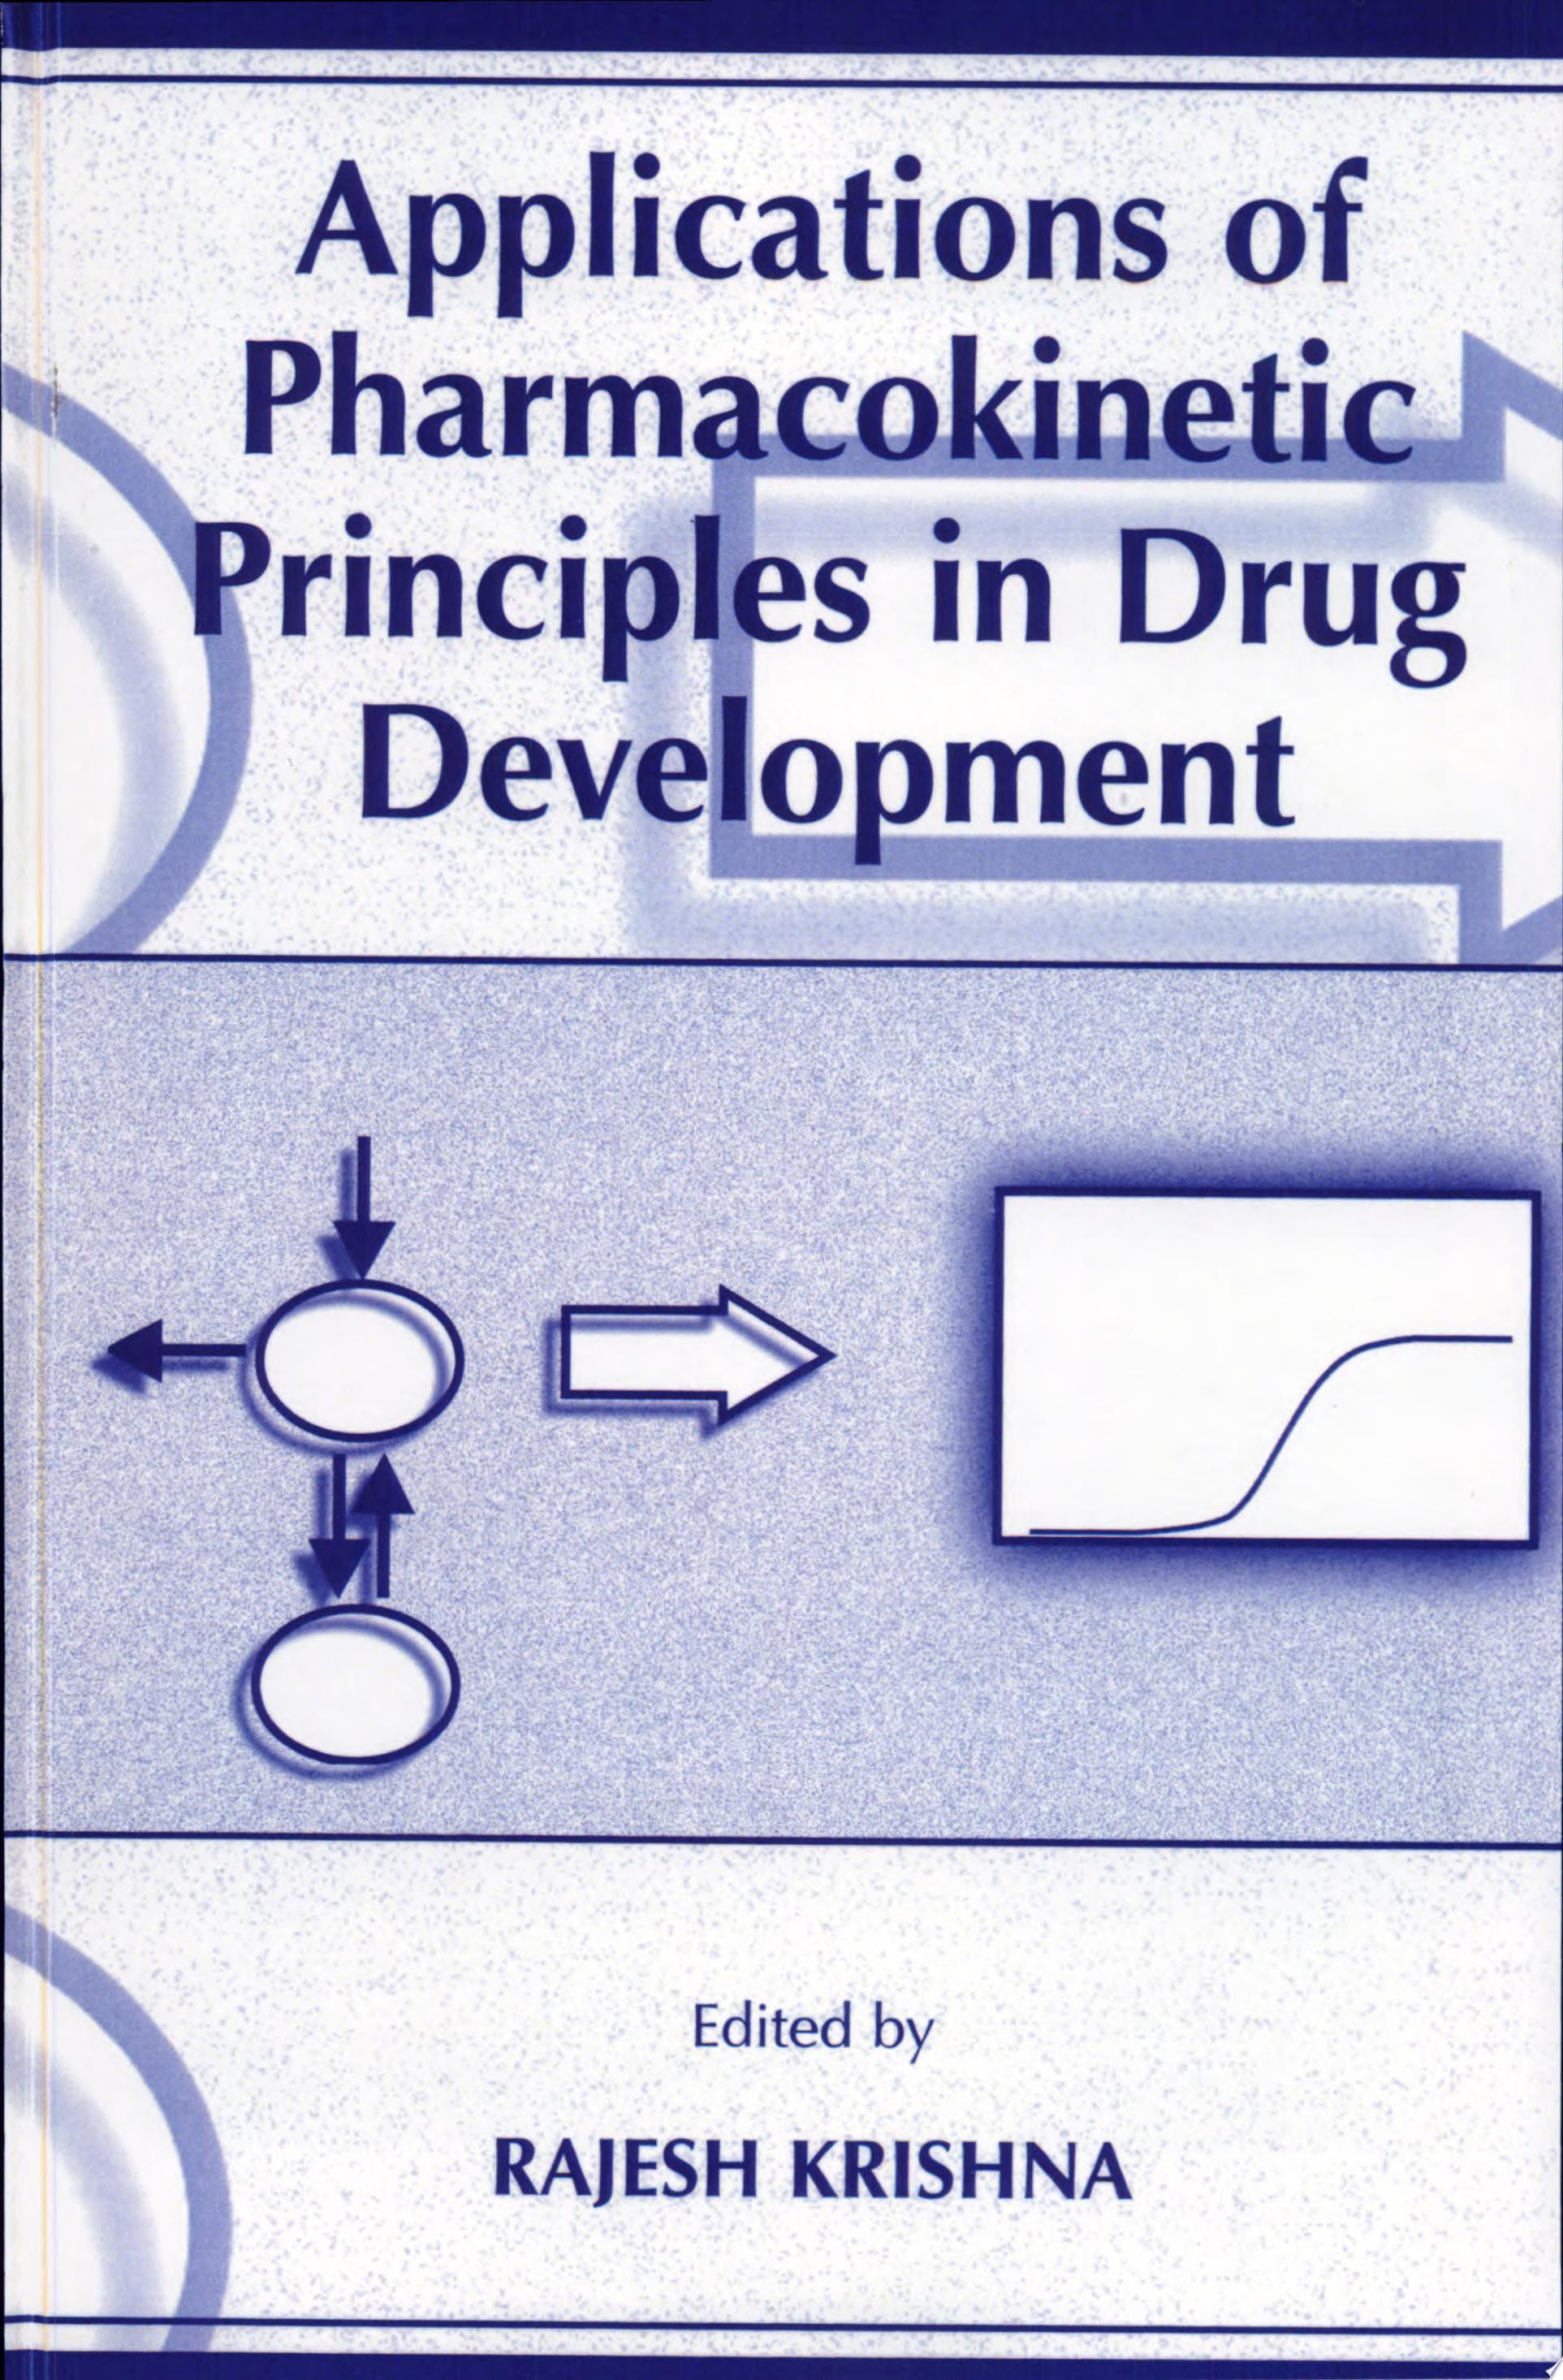 Applications of Pharmacokinetic Principles in Drug Development